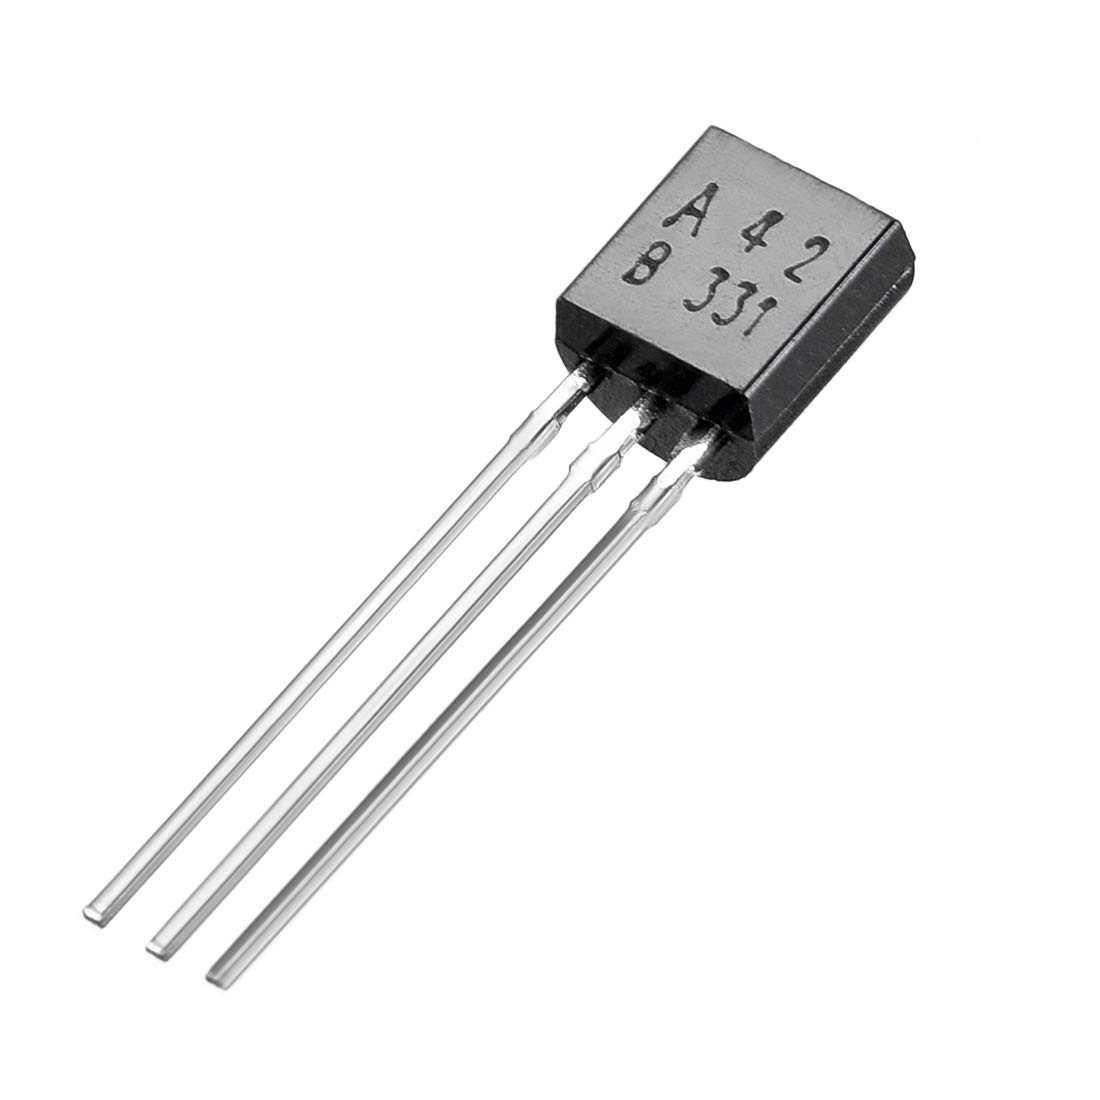 uxcell BC547B Plastic-Encapsulate Power Transistor NPN TO-92 20pcs